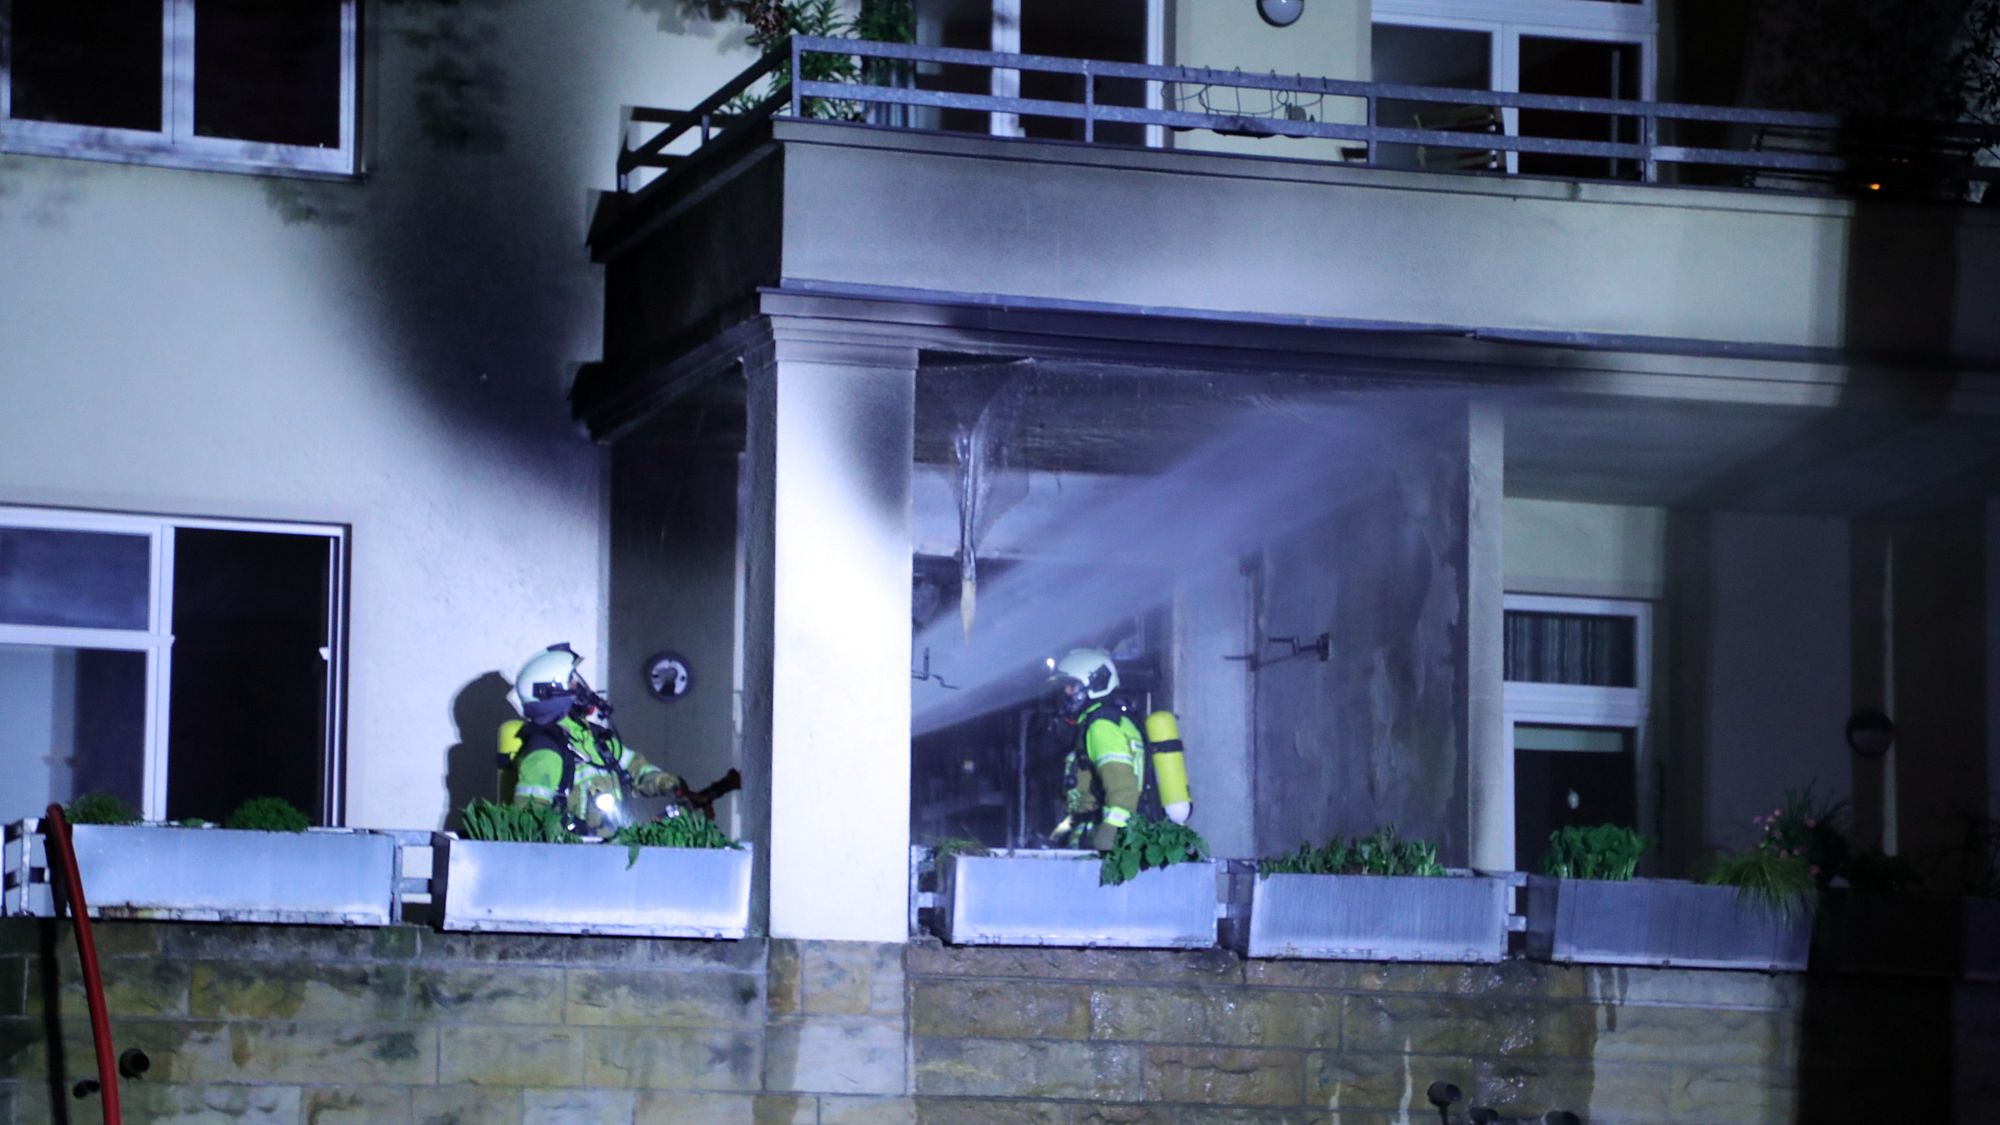 Balkonbrand gelöscht. Foto: Roland Halkasch